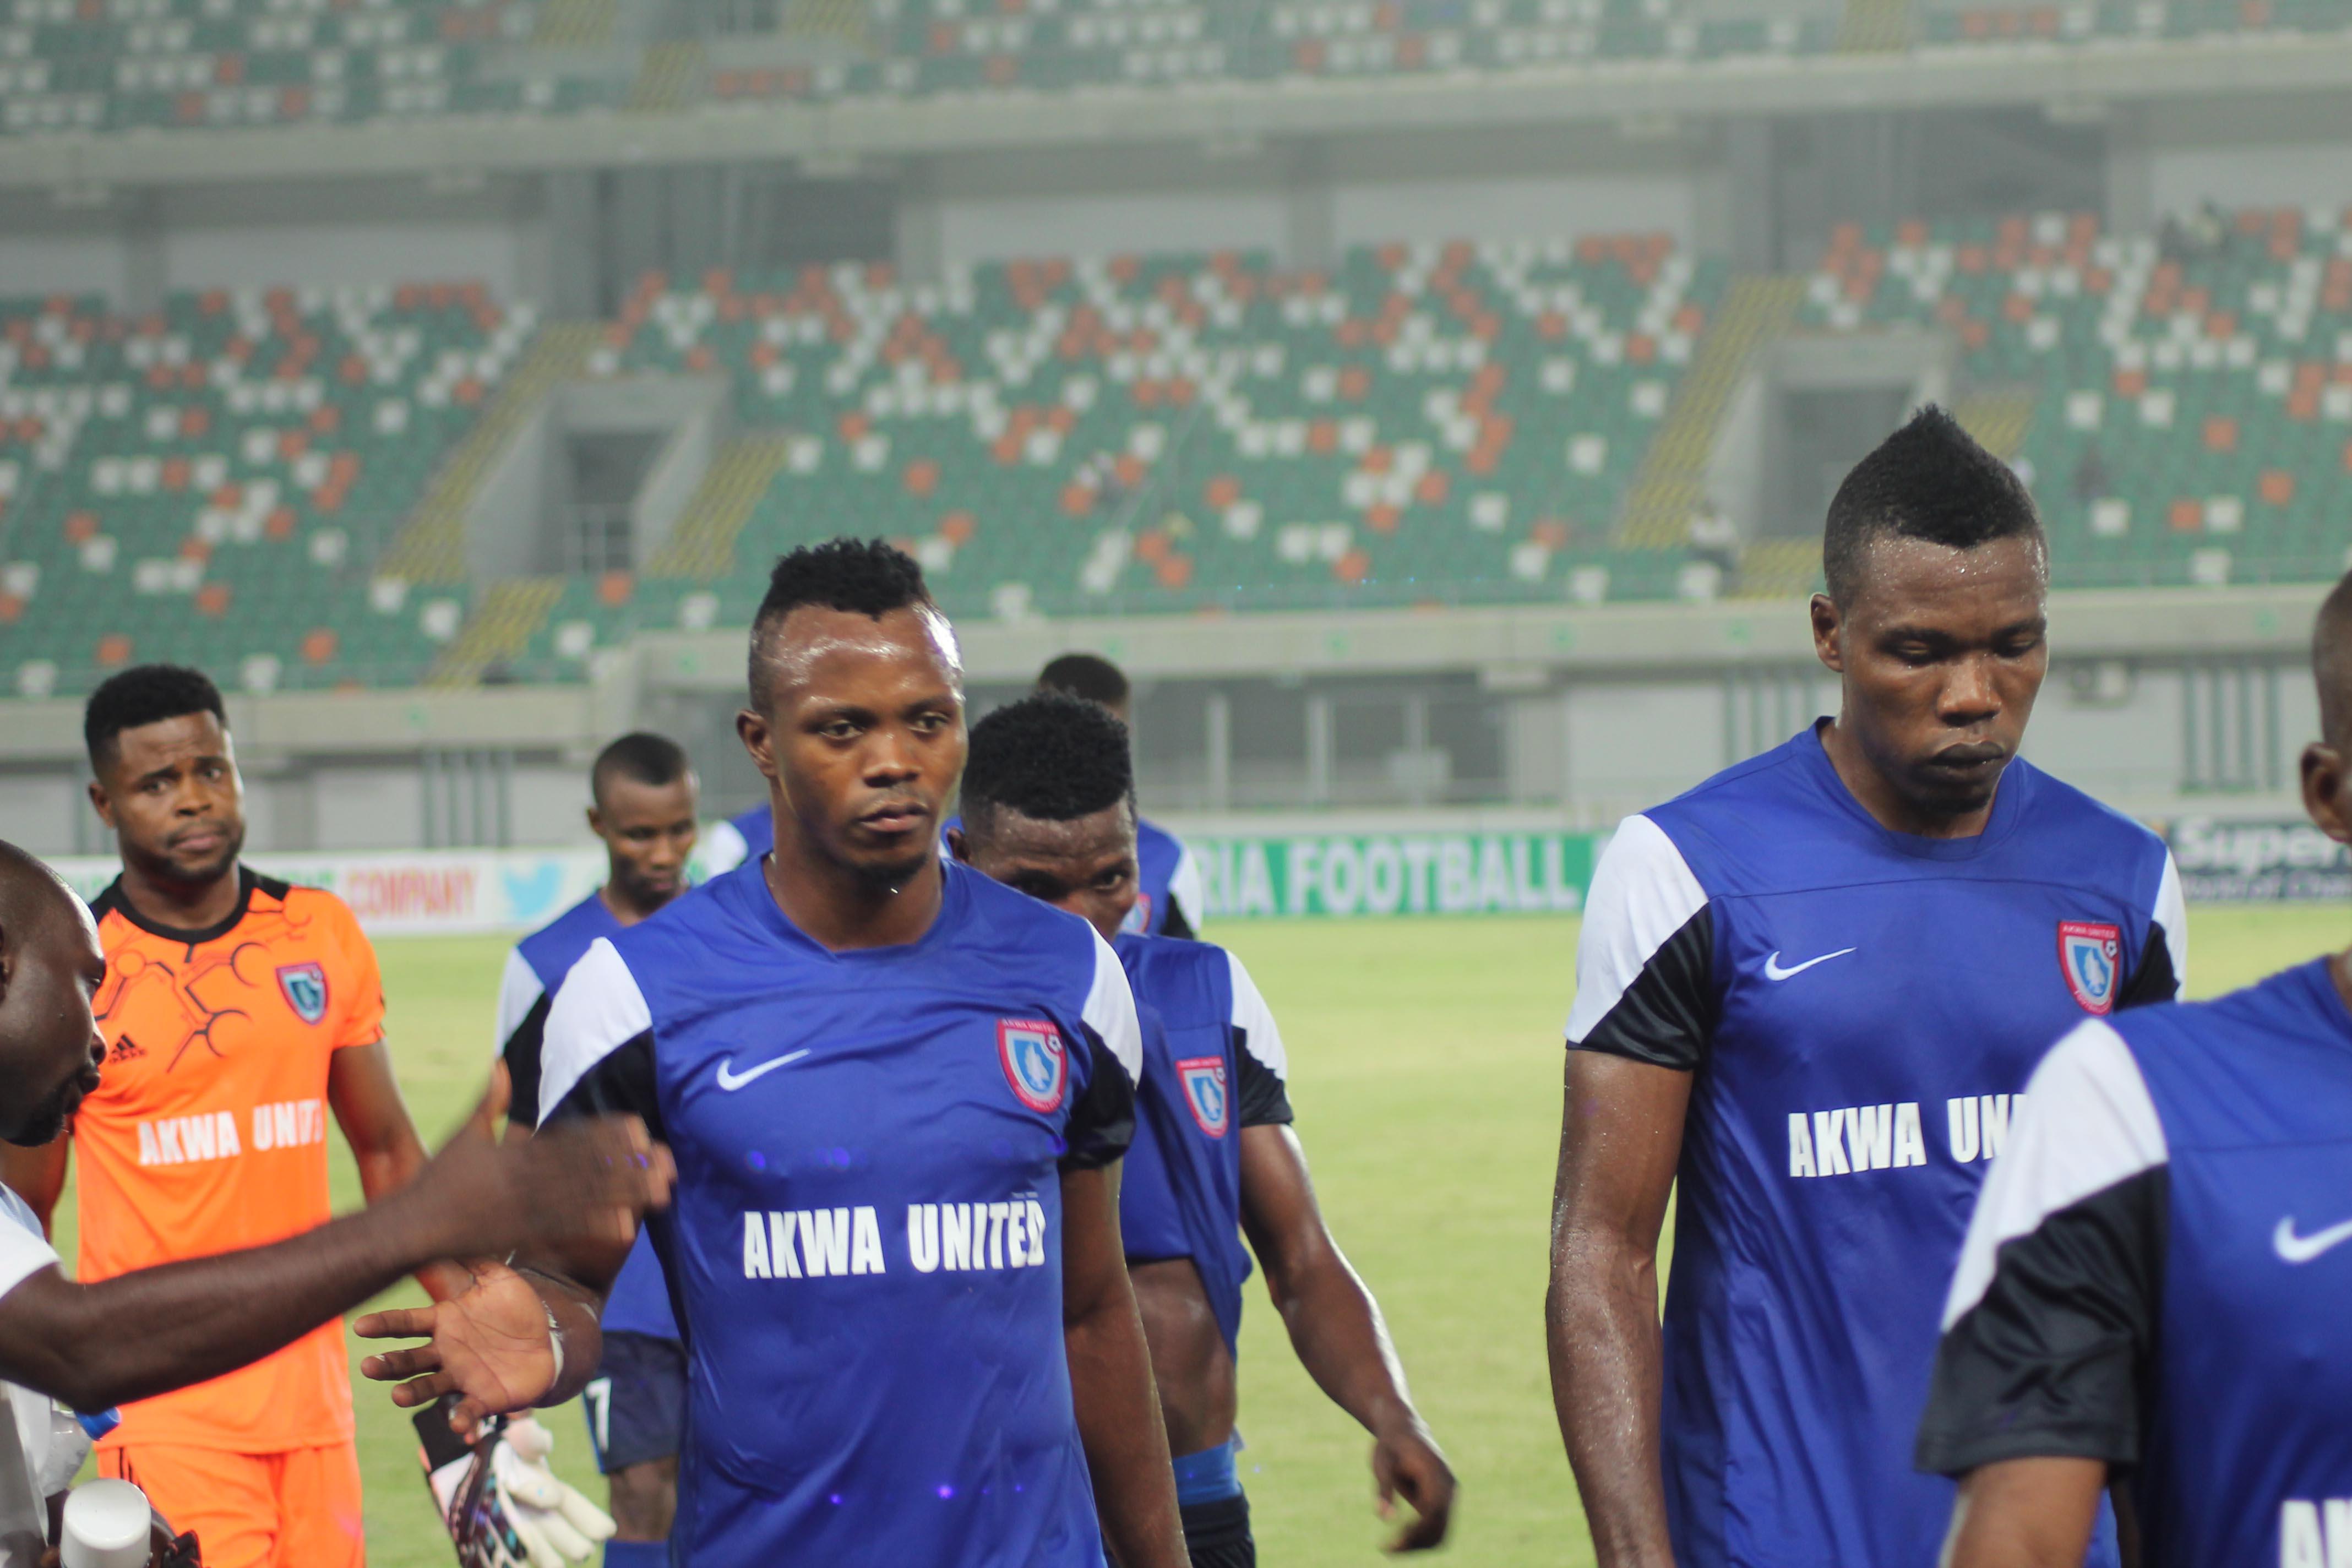 Akwa United Extend Unbeaten Run, Play Goalless with MFM in Lagos